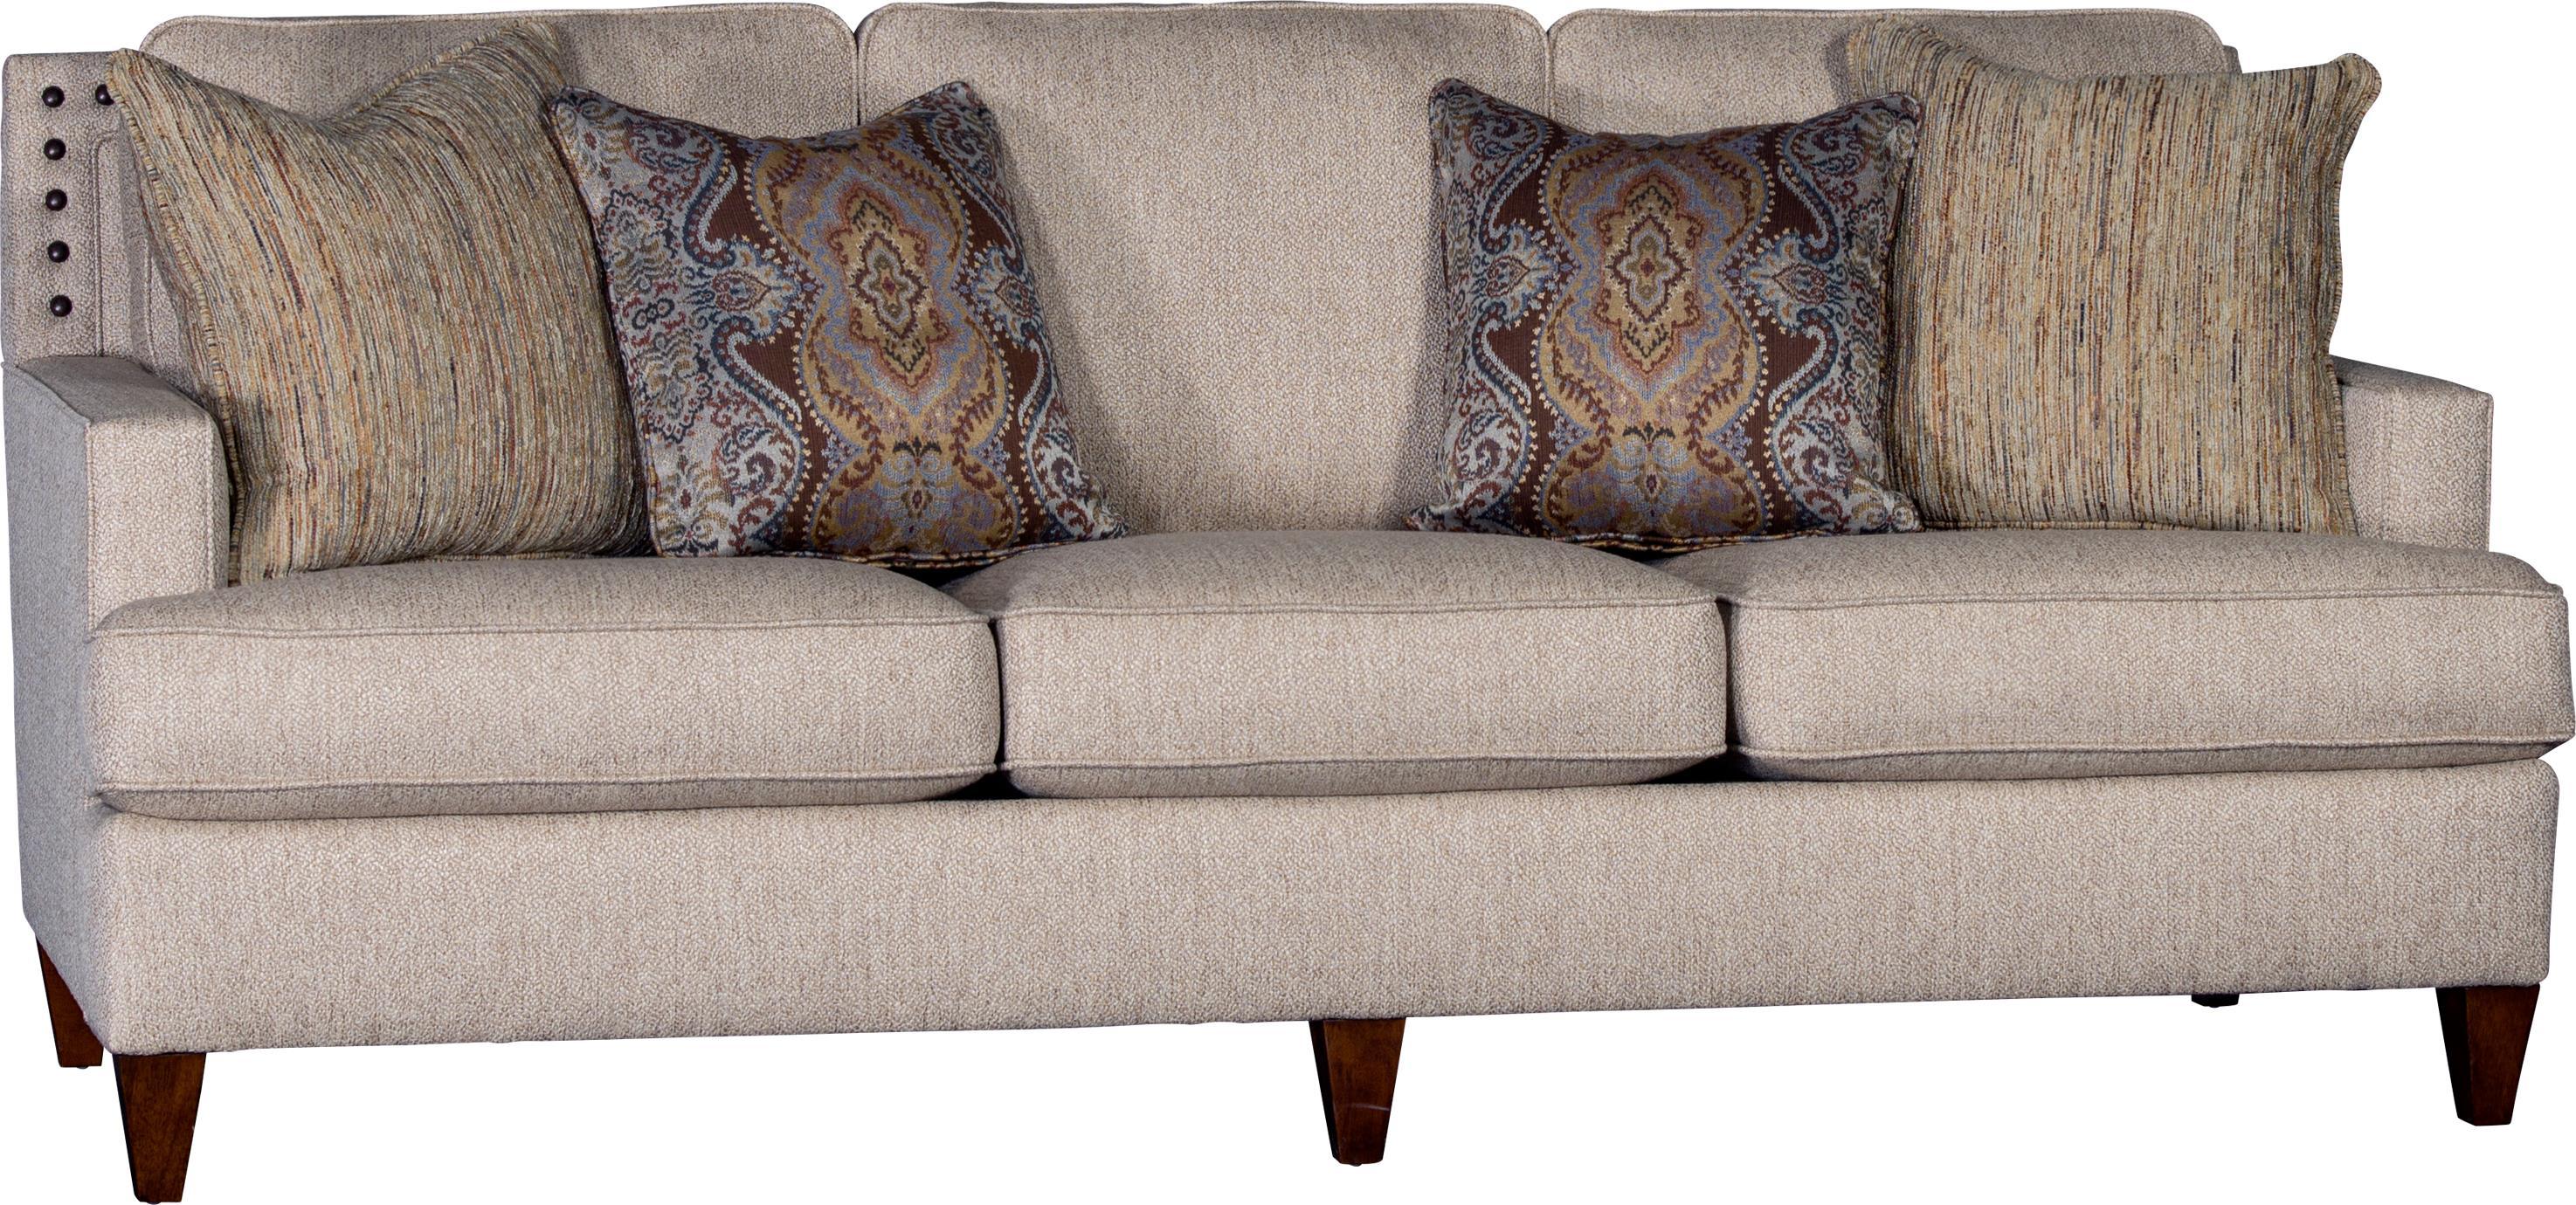 3030 Sofa by Mayo at Wilson's Furniture